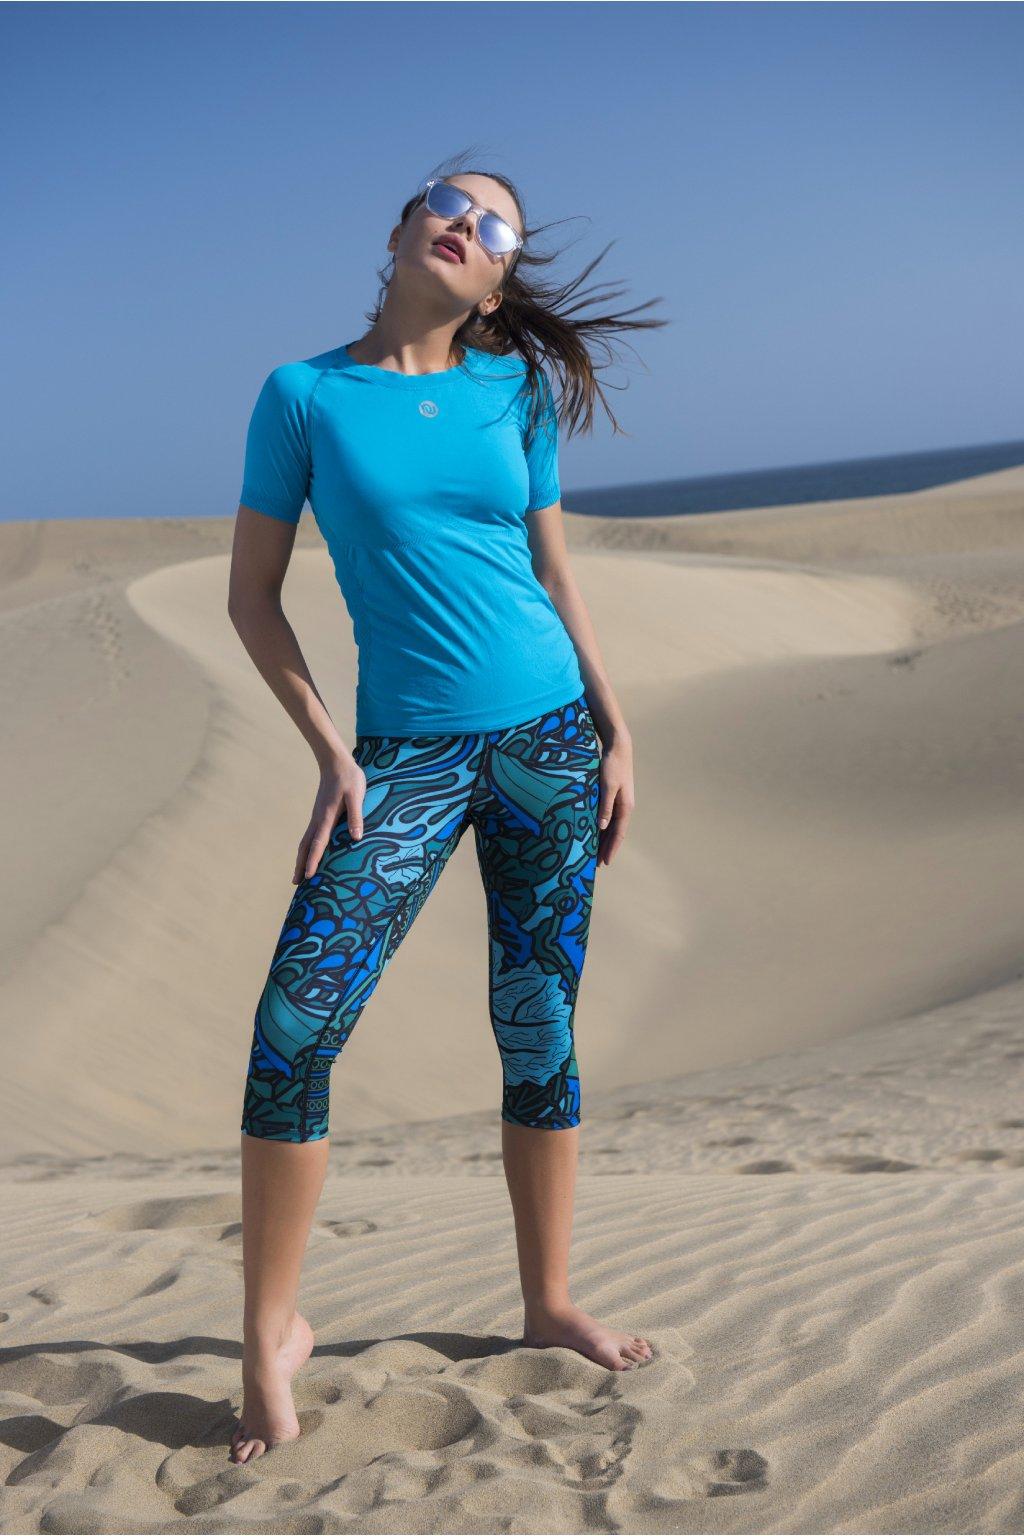 Krátké Běžecké/Fitness Legíny OSTK-9M2 - Mosaic turquoise